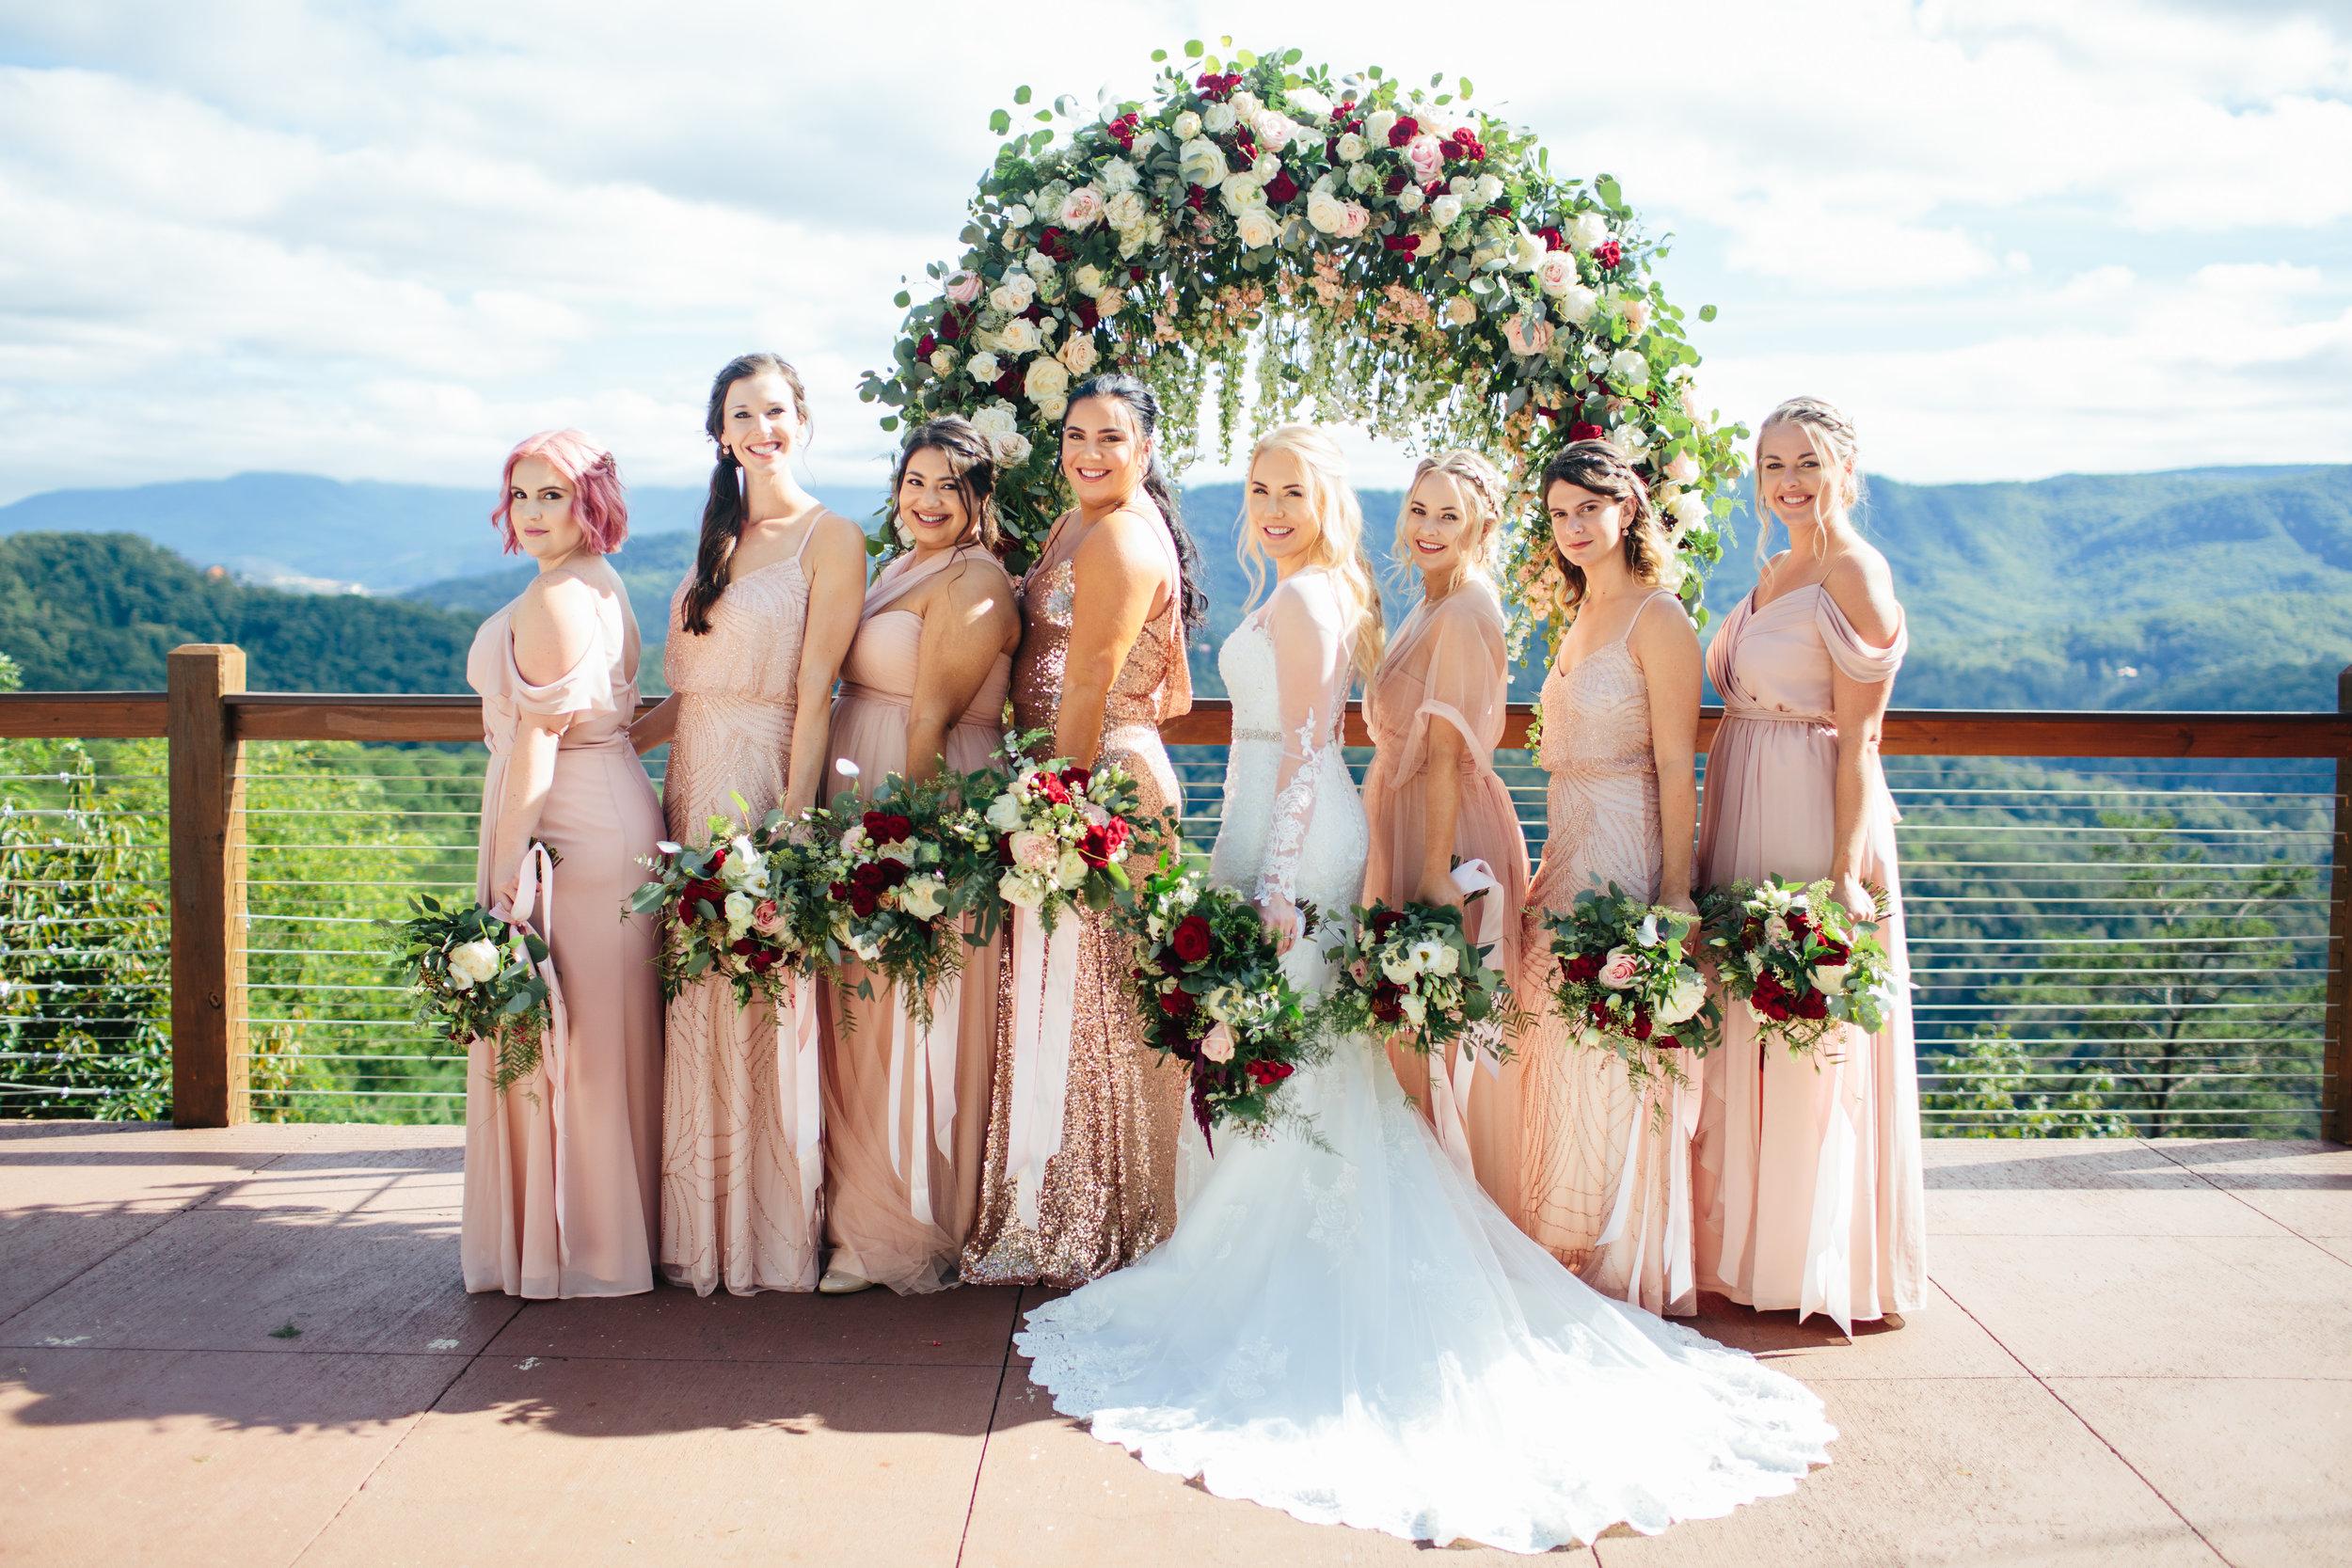 From left to right: Cara, Faith, Thasin, Julie, Sarah, Alex, Jessica